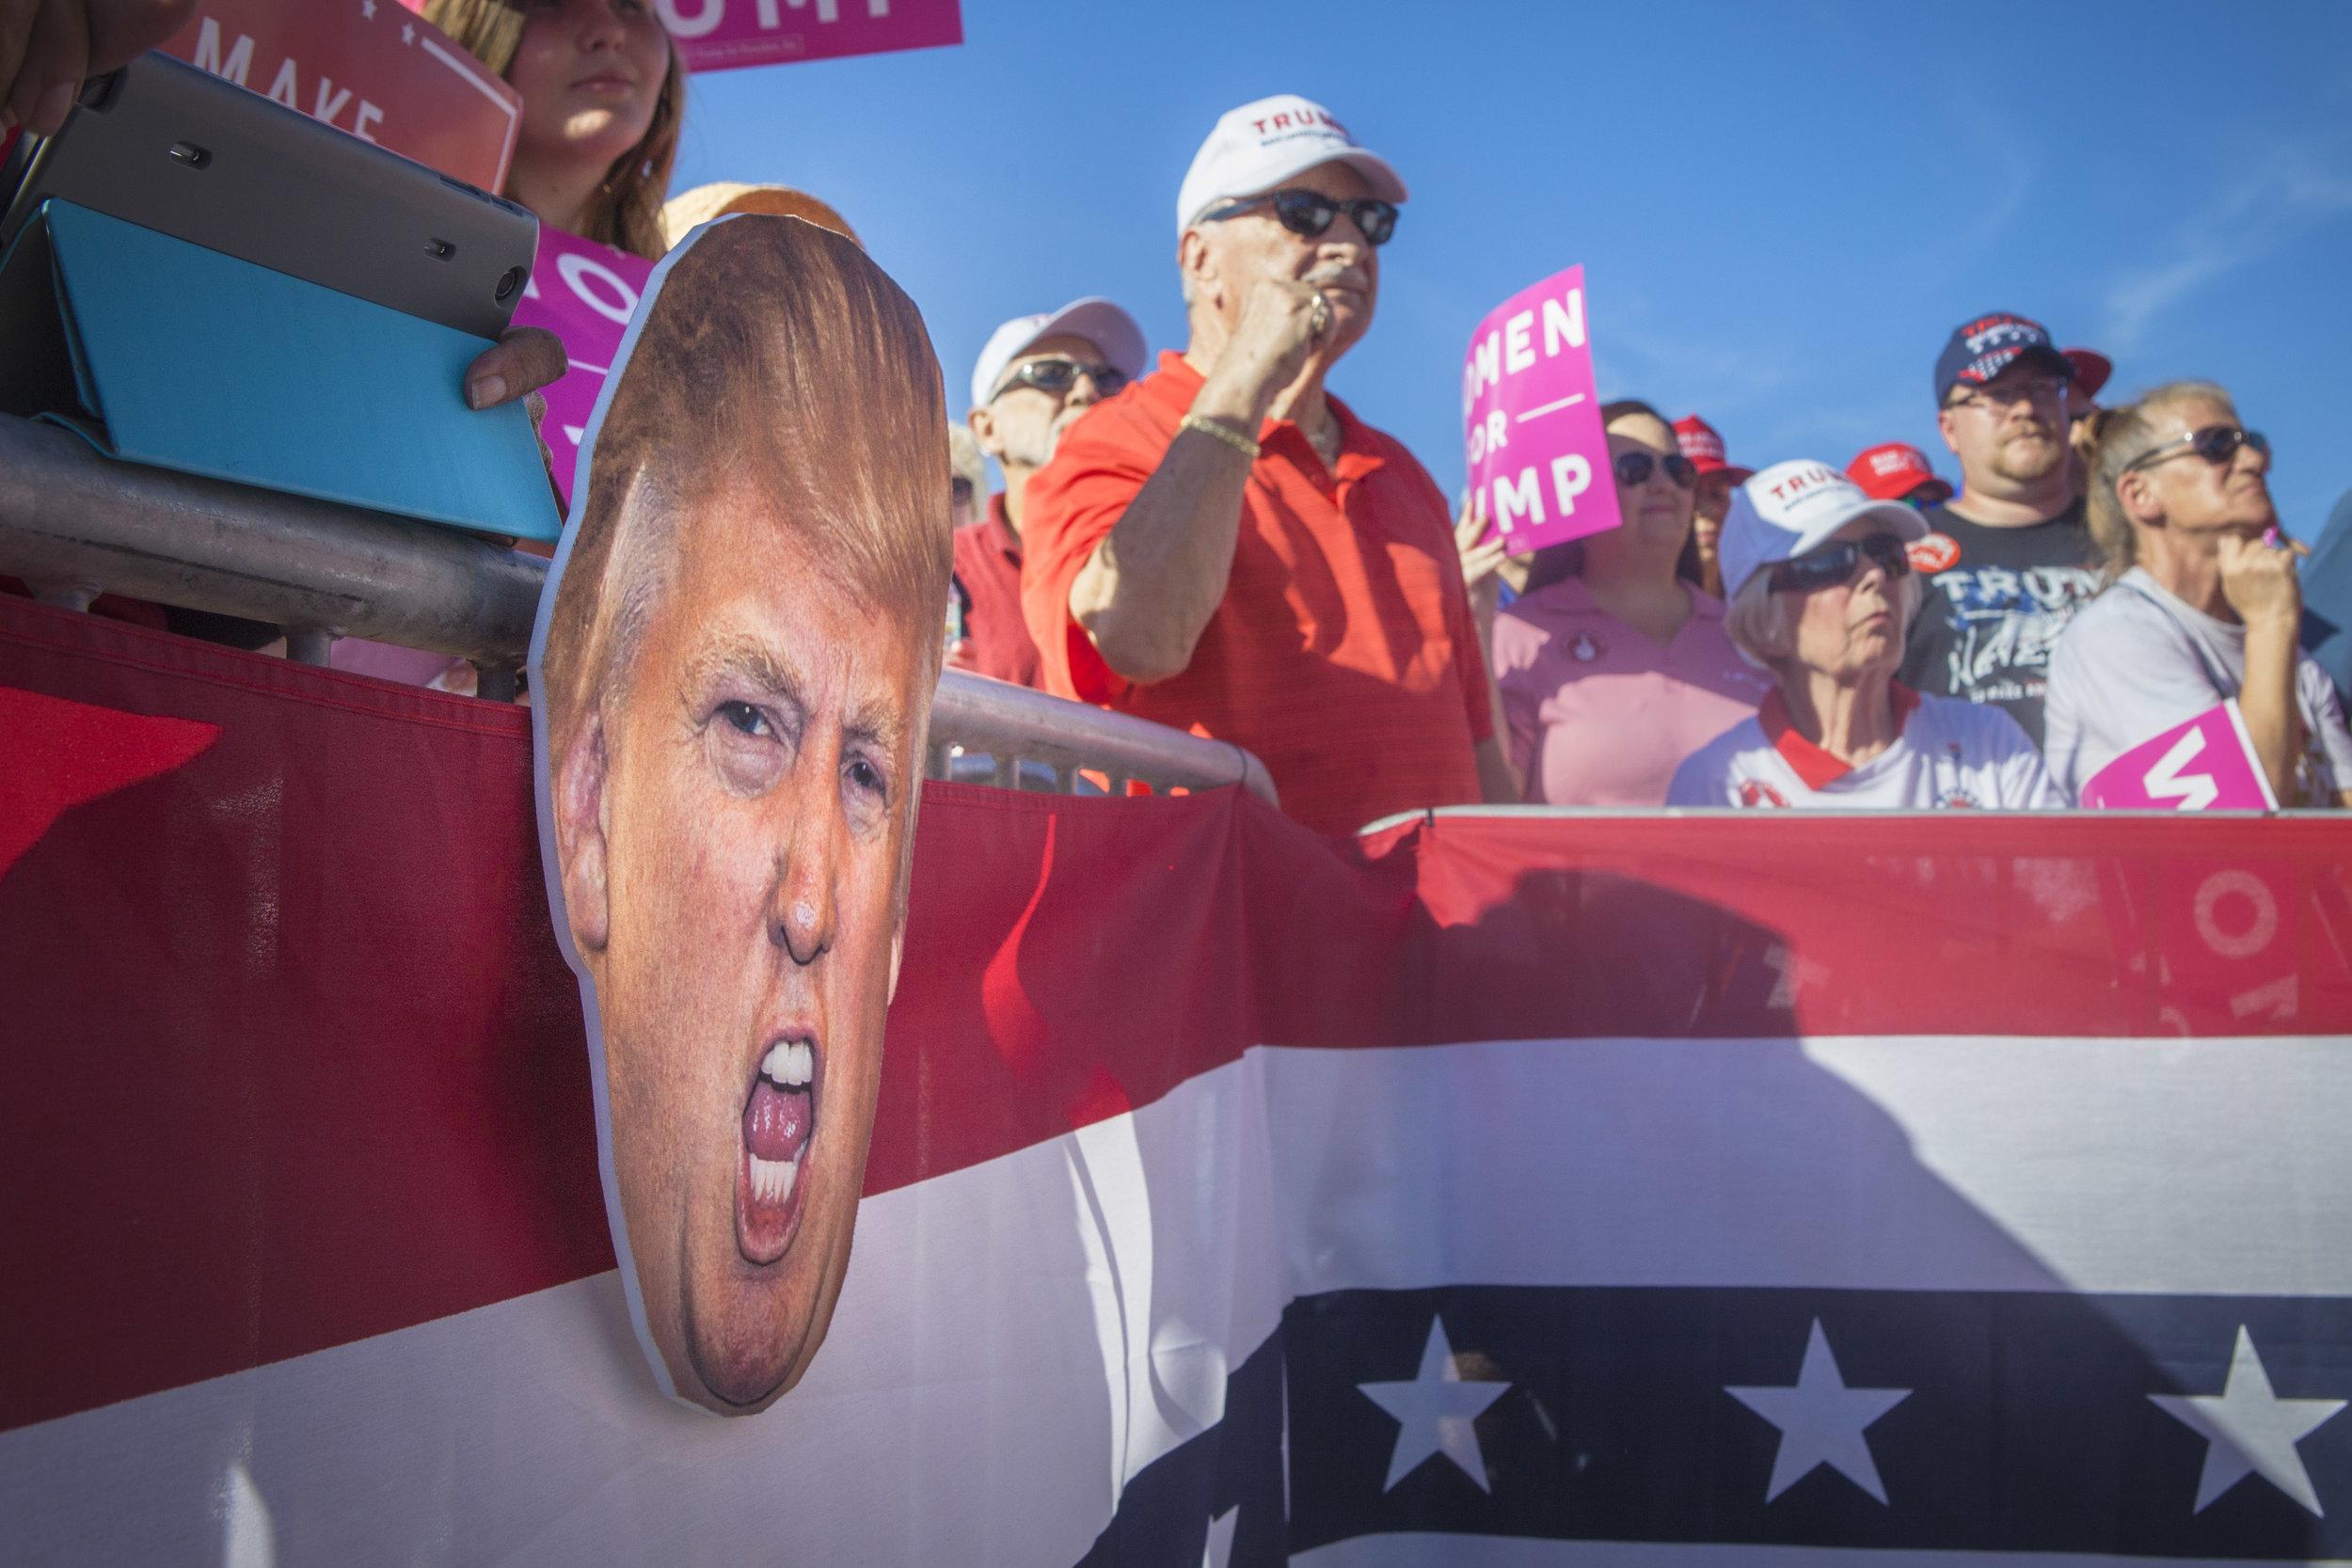 11022016_BJM_Donald_Trump_Rally_in_Orlando_Florida_04.jpg